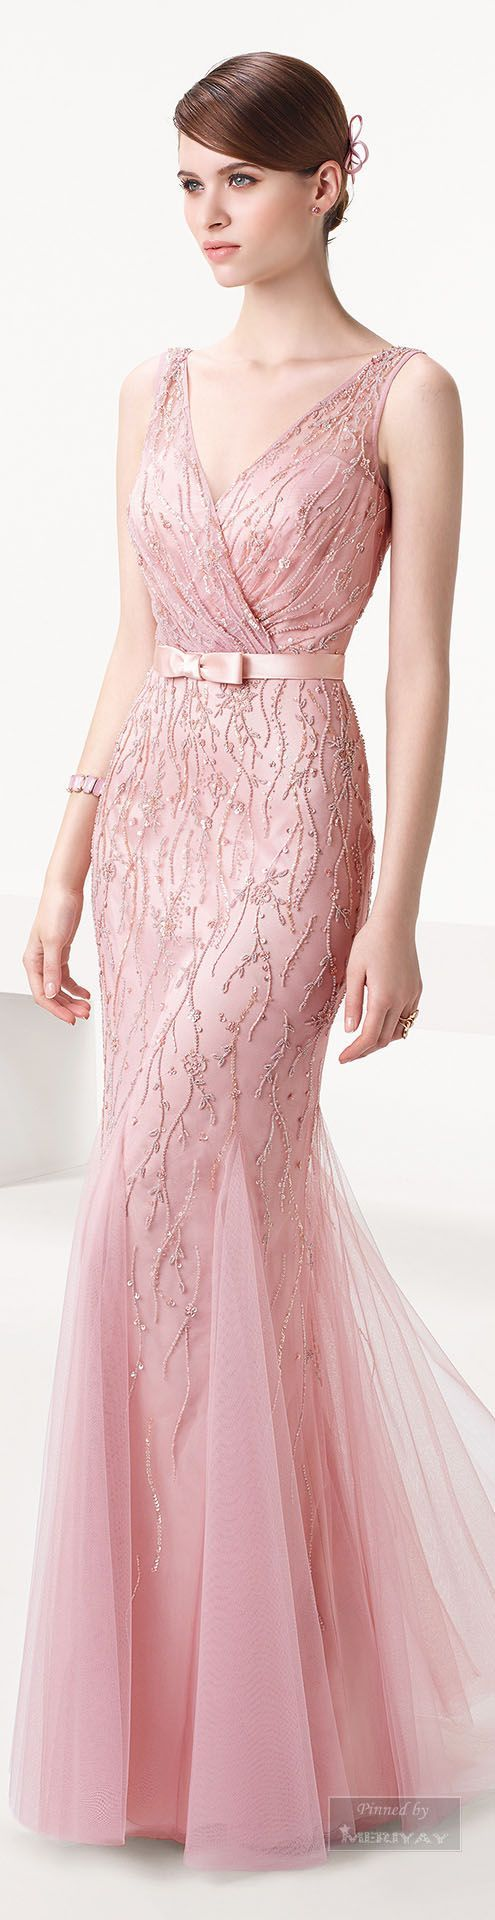 Soft Pink Wedding LovelyIdeas | civil | Pinterest | Vestiditos ...